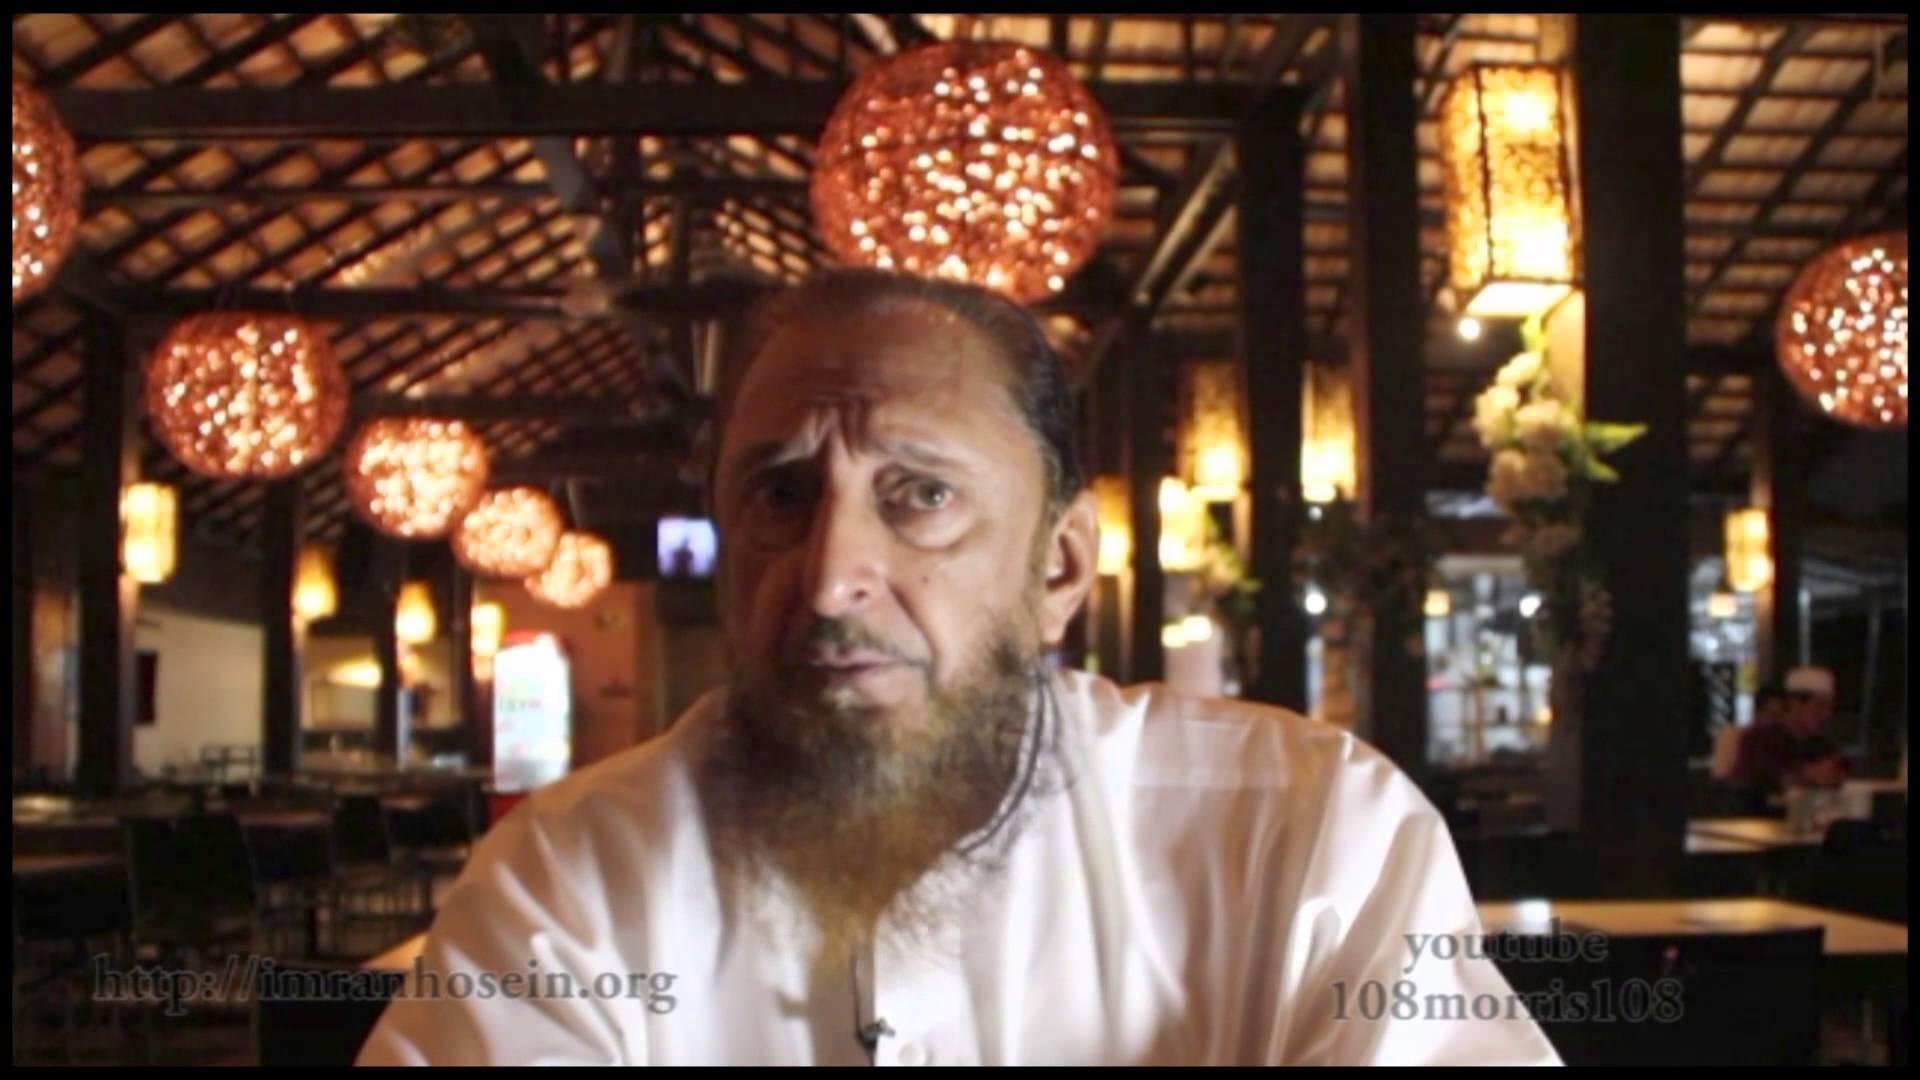 Sheikh Imran Nazar Hosein: Singapore is the Little Israel in Asia